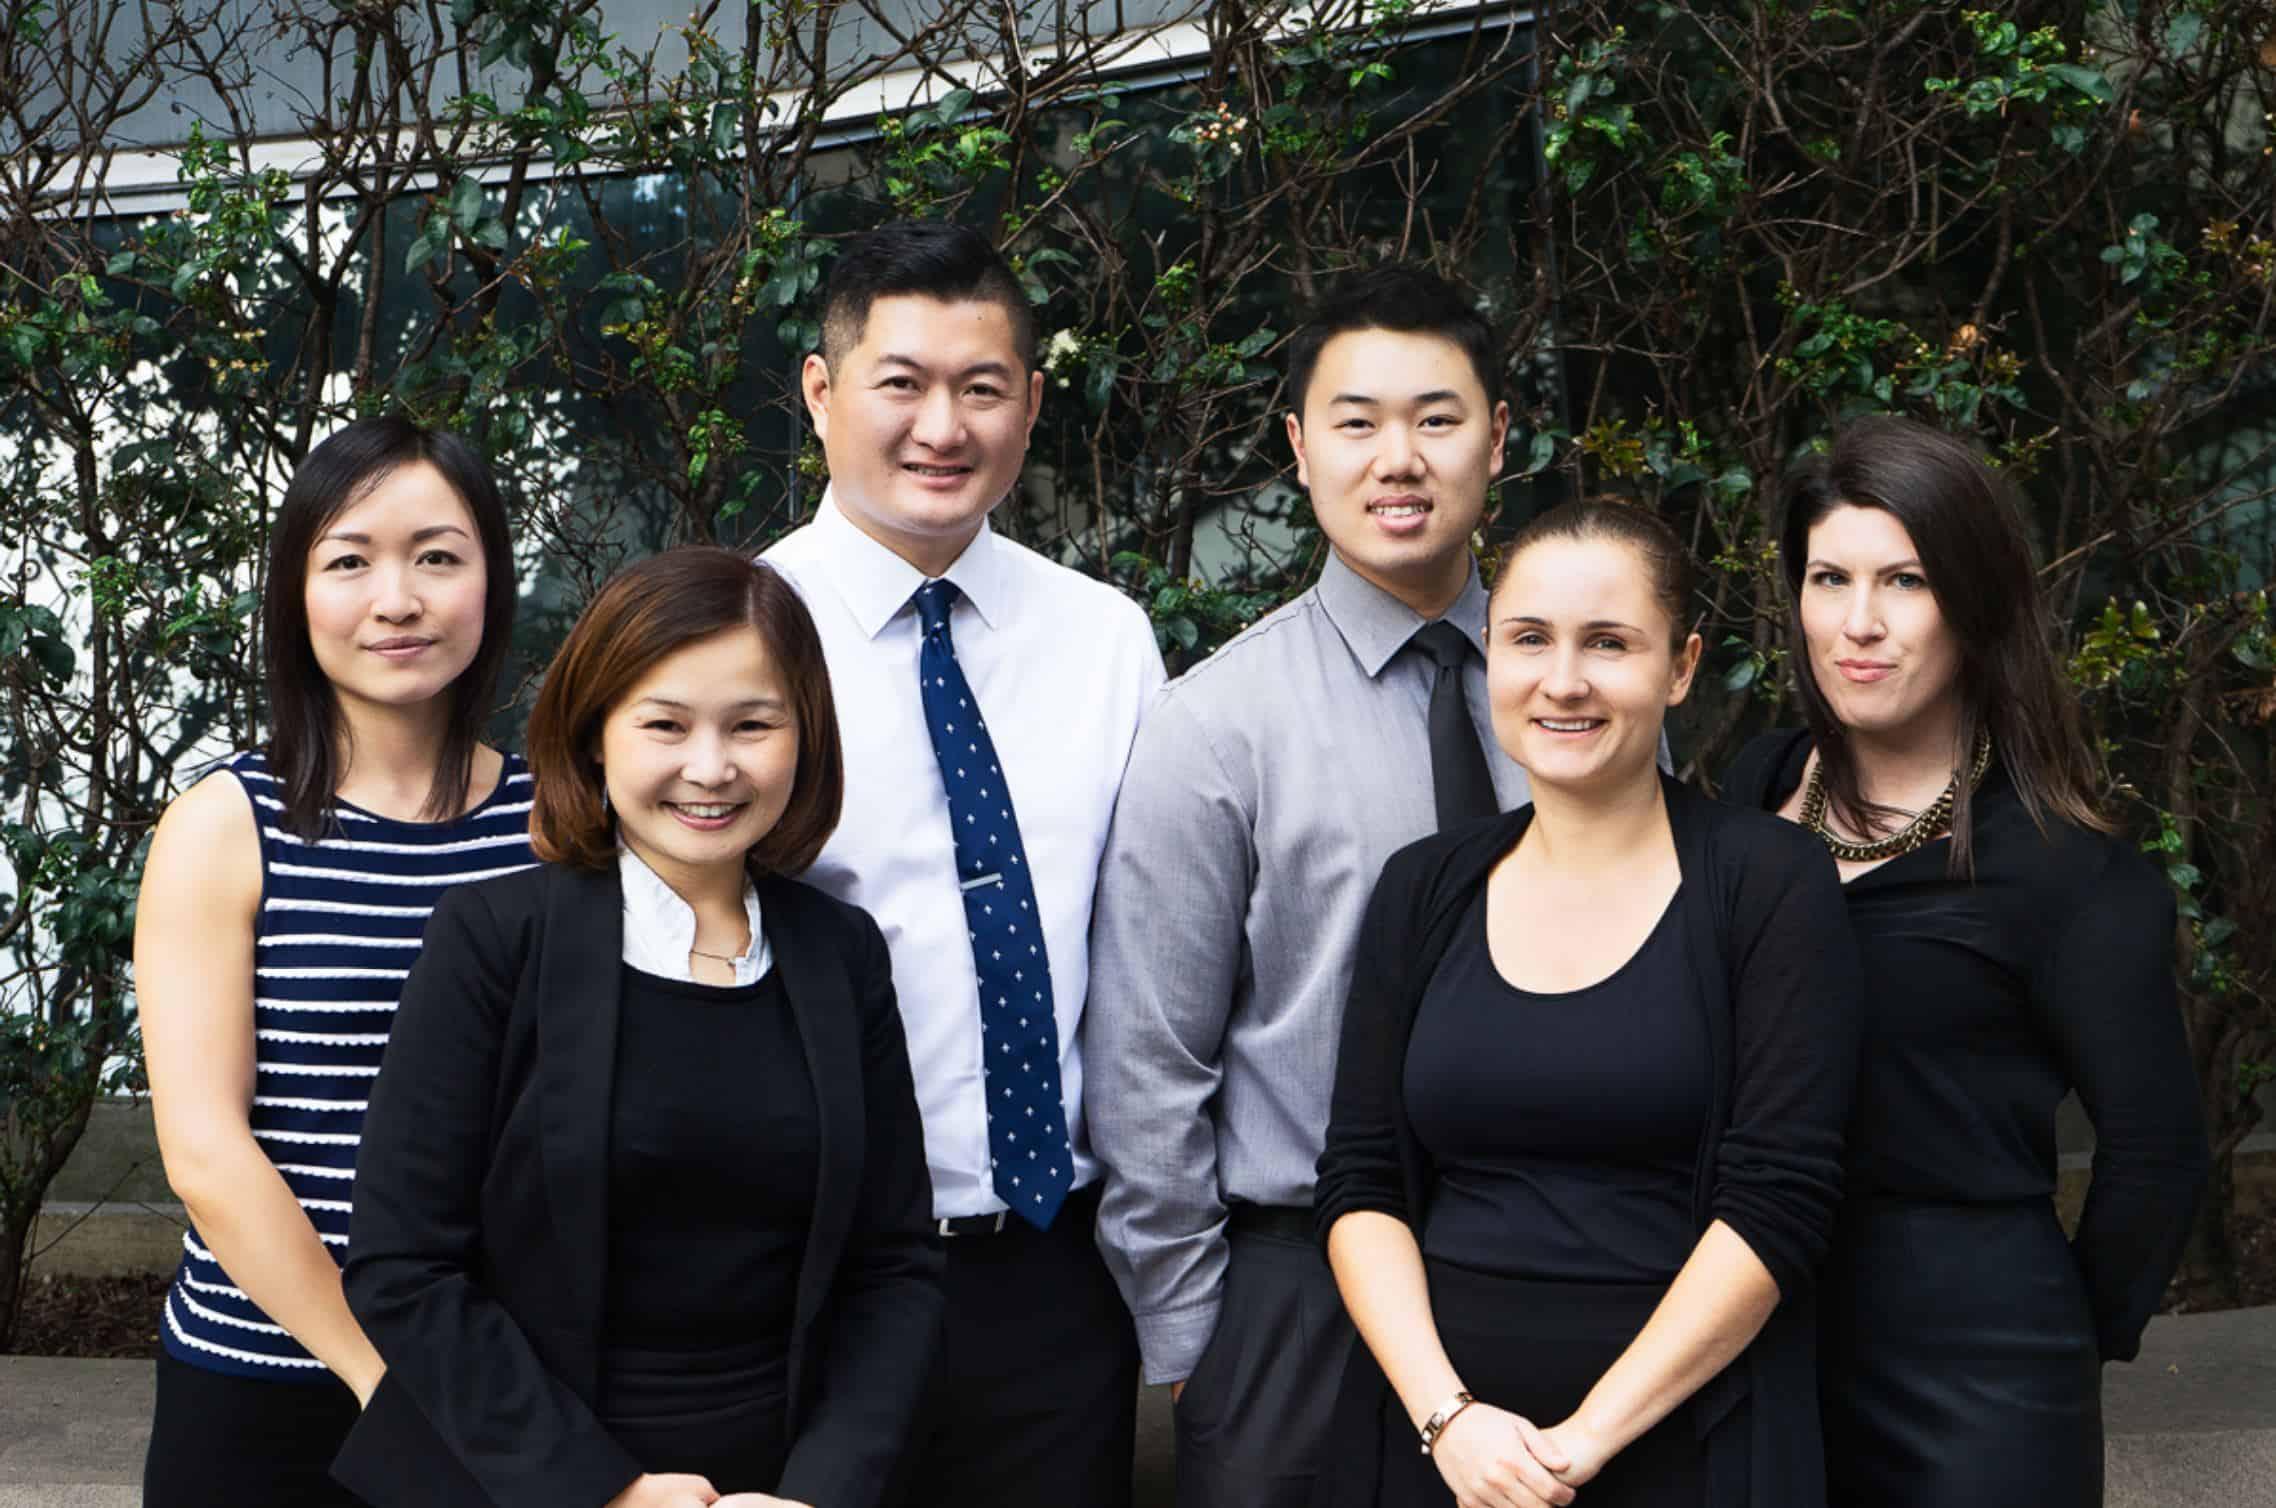 theeyecarecompany by G&M Eyecare - Sydney